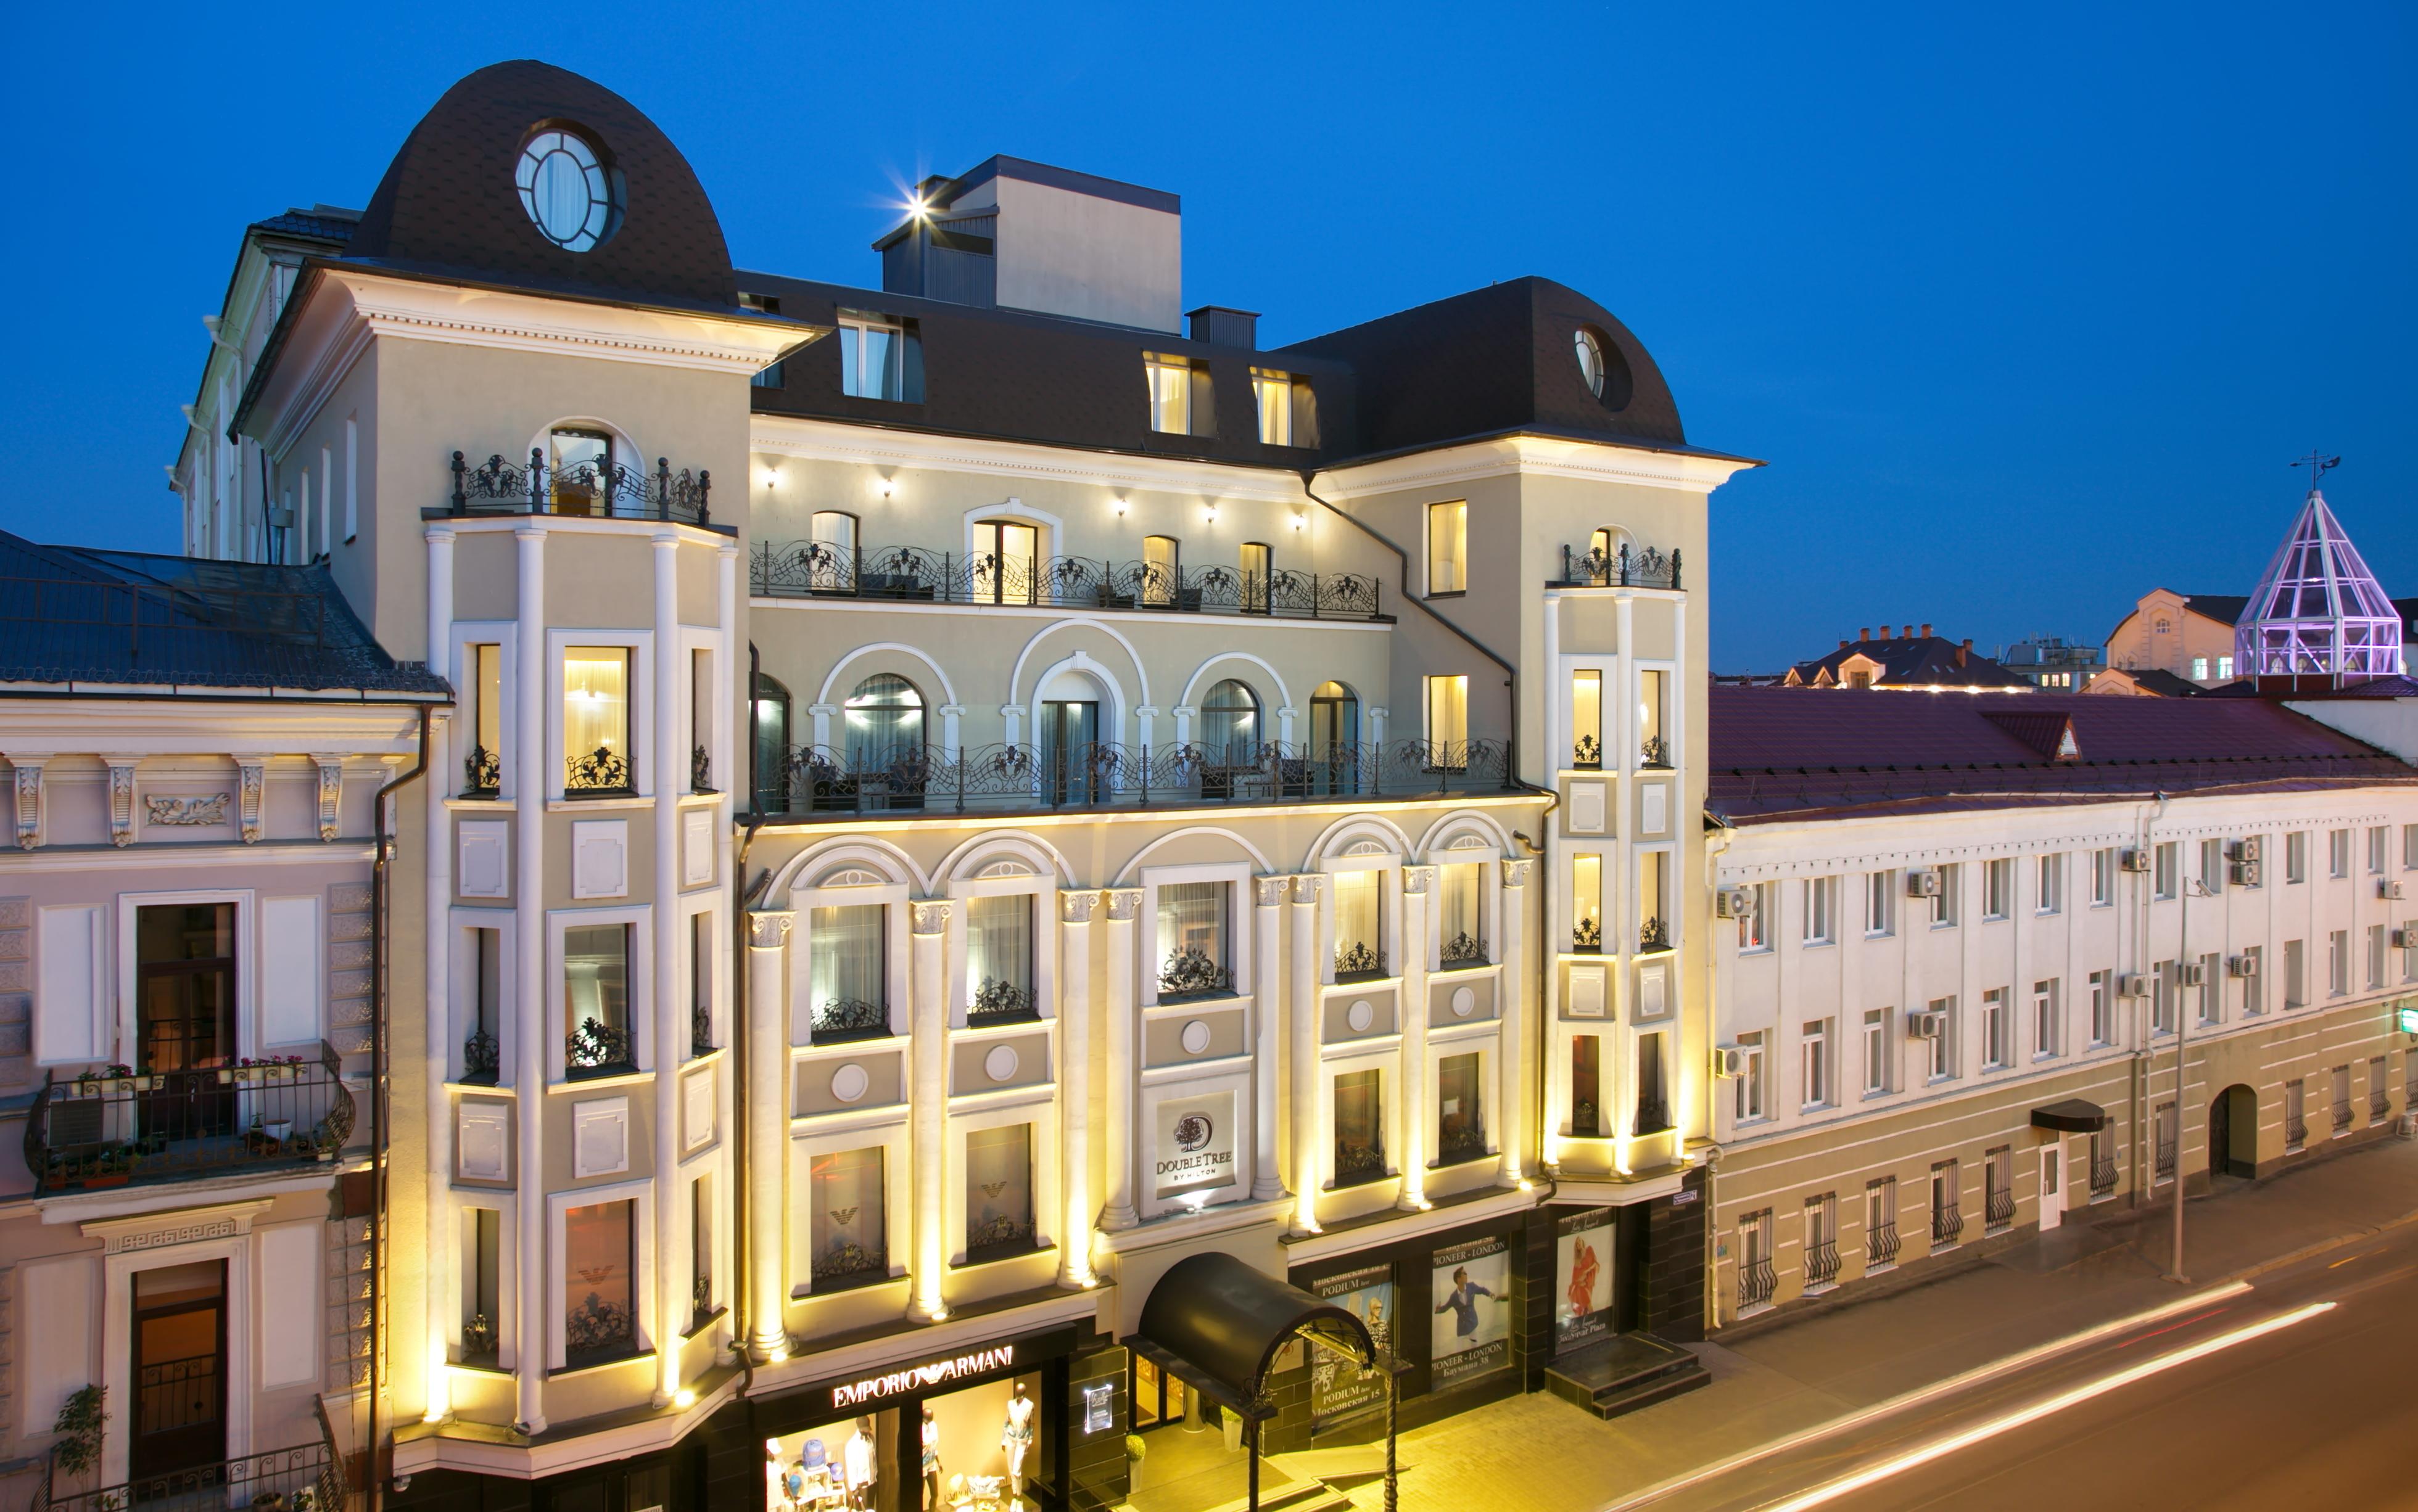 Отель Doubletree by Hilton Kazan City Center, Казань, Россия